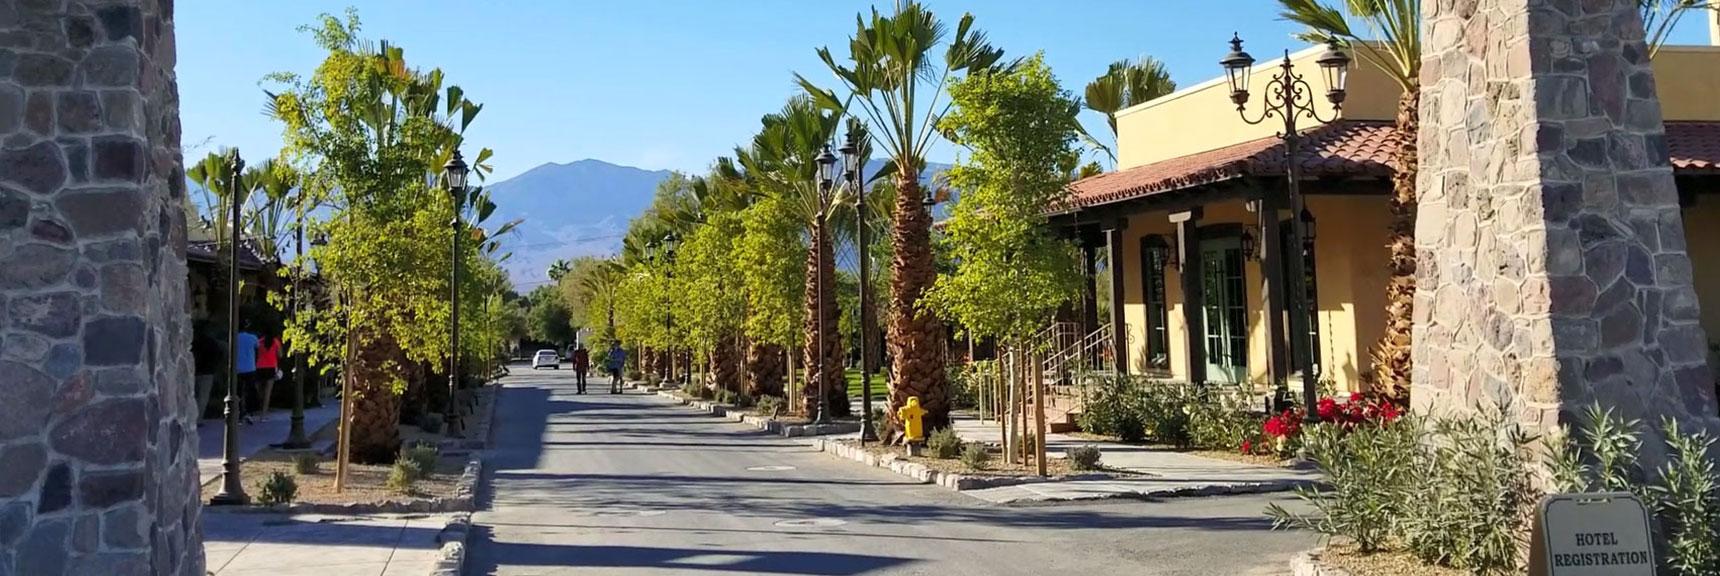 Death Valley National Park Furnace Creek Ranch November 24th 2018